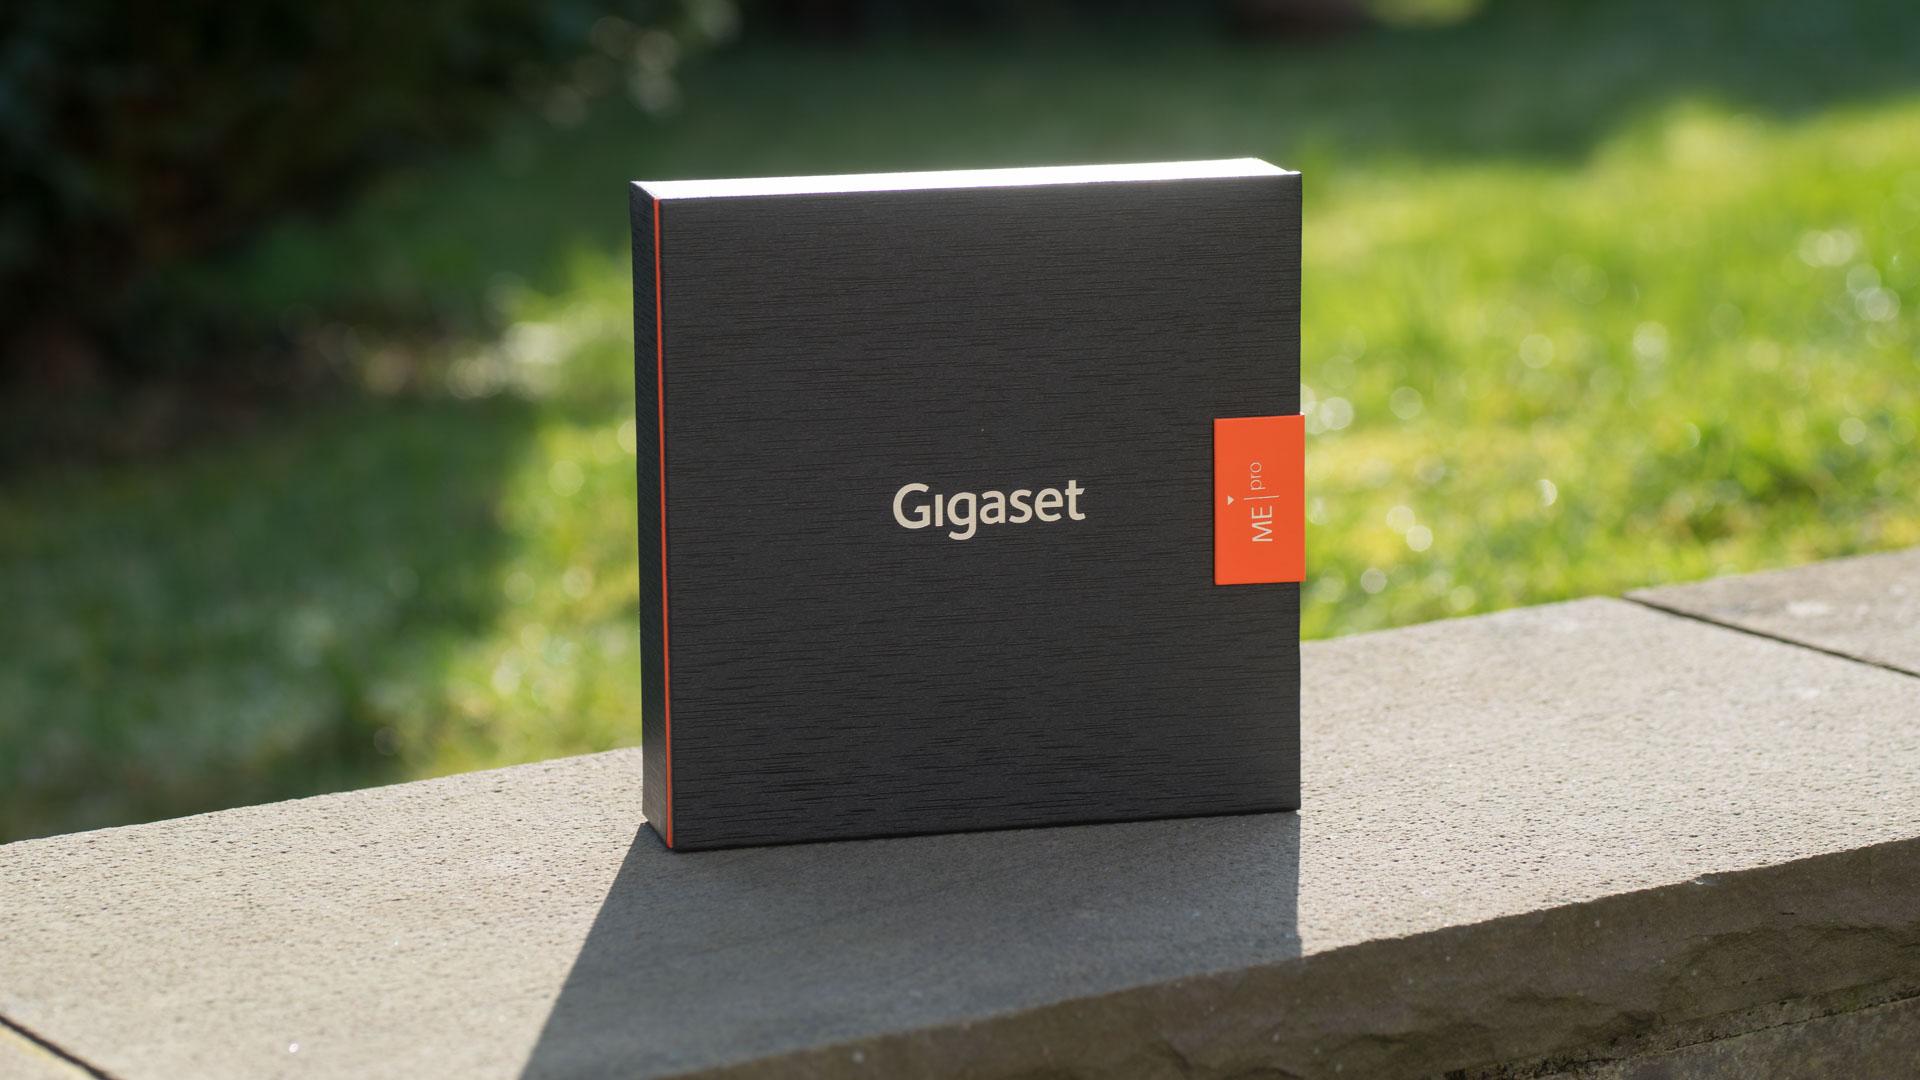 Das Gigaset ME Pro im Test (5,5″, Snapdragon 810, 20MP ...